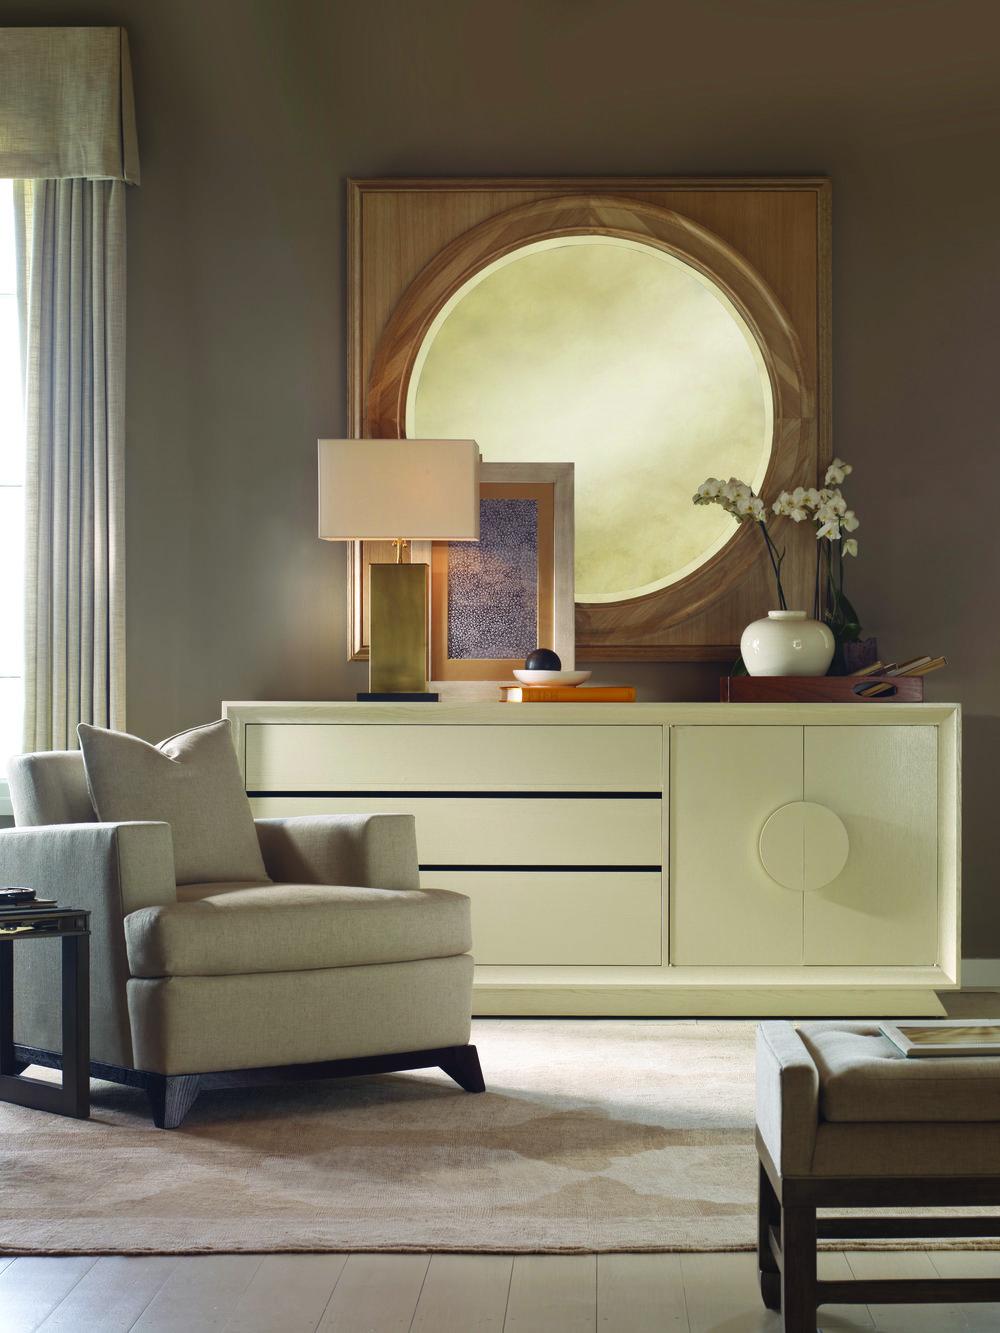 金色古董質感裝飾鏡Bernhardt Furniture Salon Mirror, Price Upon Request At Paramount Furniture, (604) 273-0155 paramountfurniture.ca